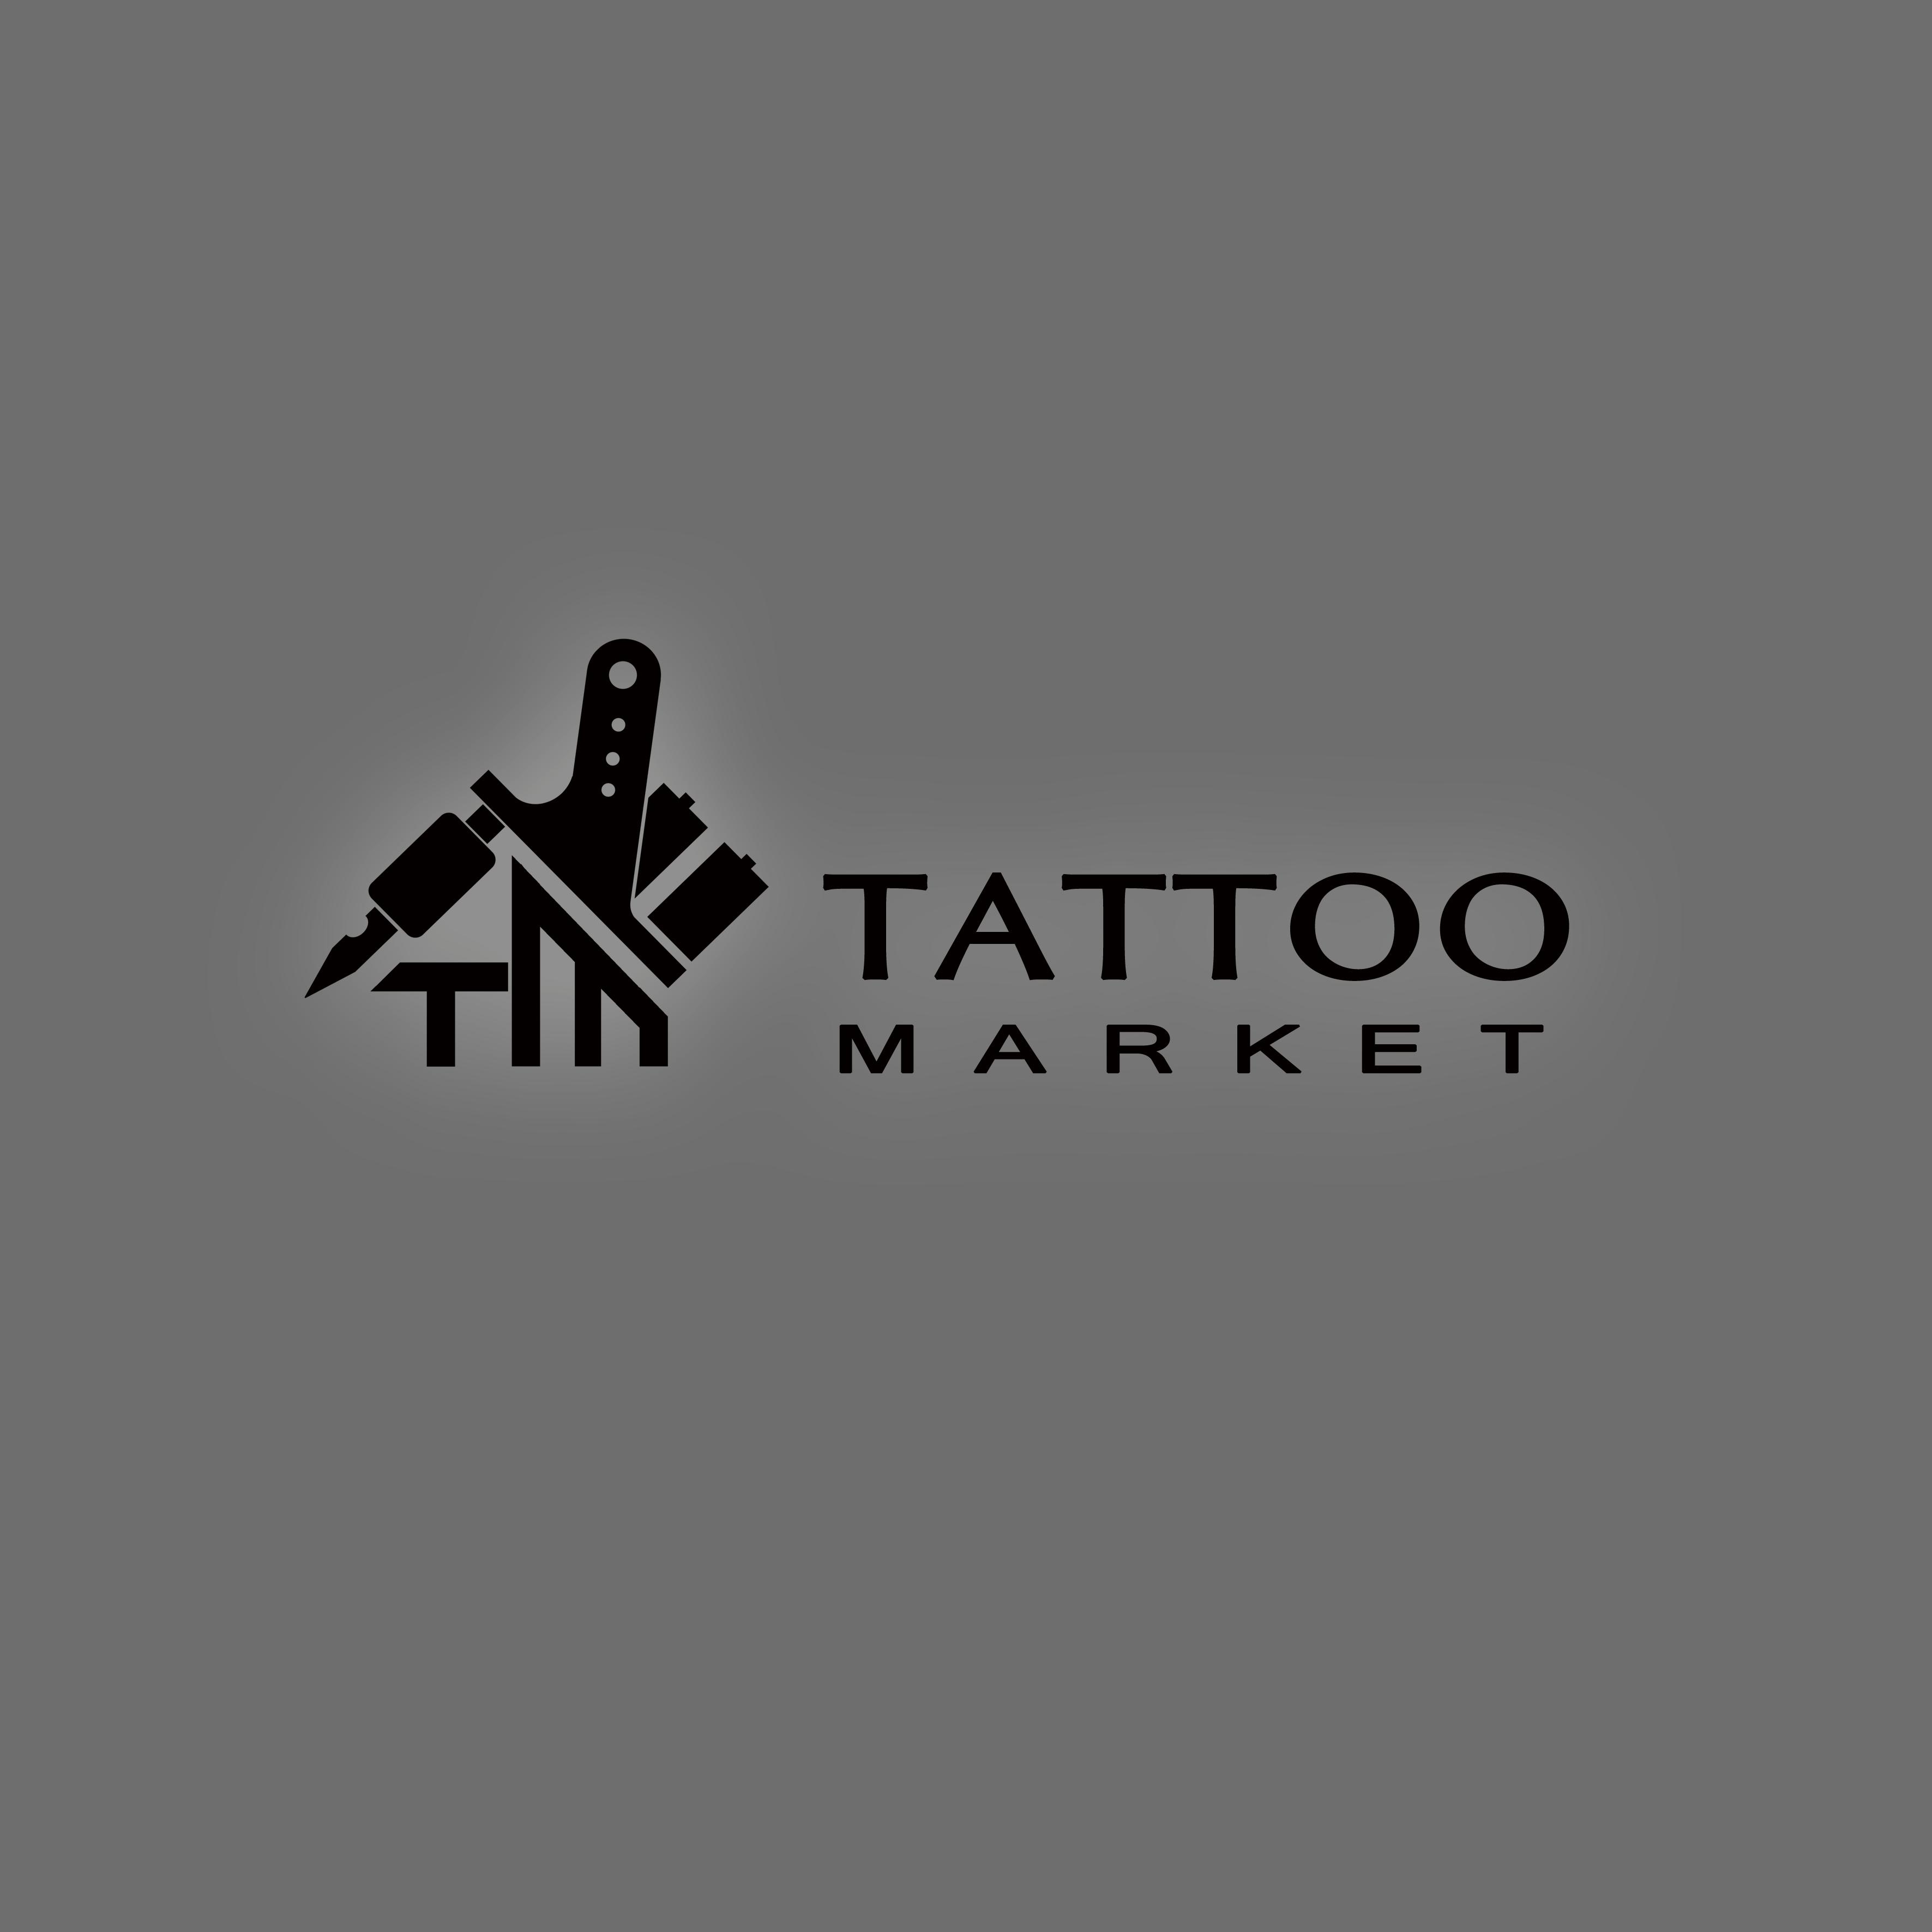 Редизайн логотипа магазина тату оборудования TattooMarket.ru фото f_2445c40ab84f027a.jpg